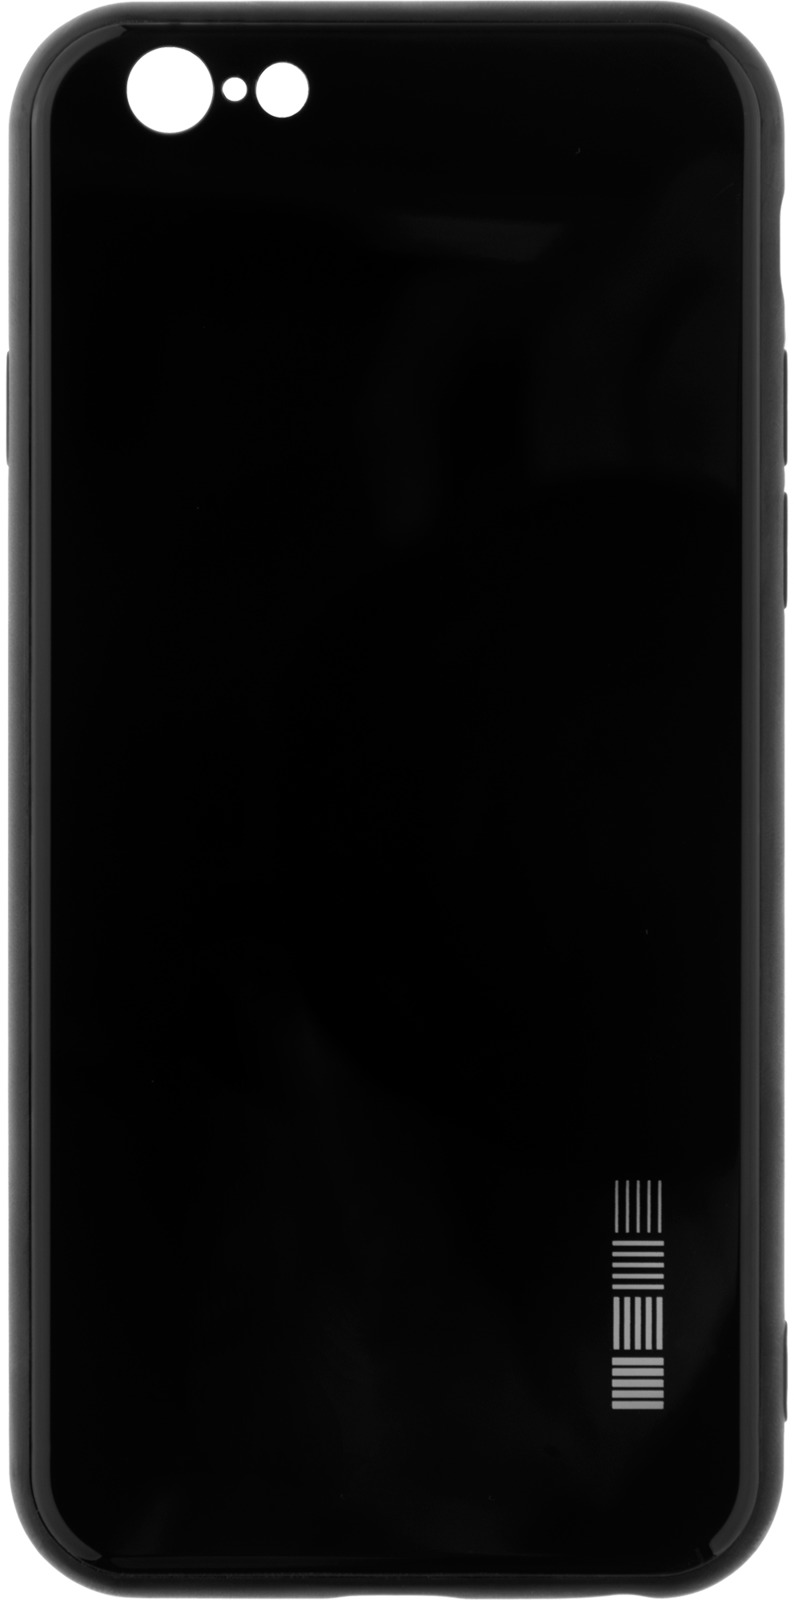 Чехол-накладка Interstep Is Glass для Apple iPhone 6/6S, Black чехол накладка interstep is glass для apple iphone x red